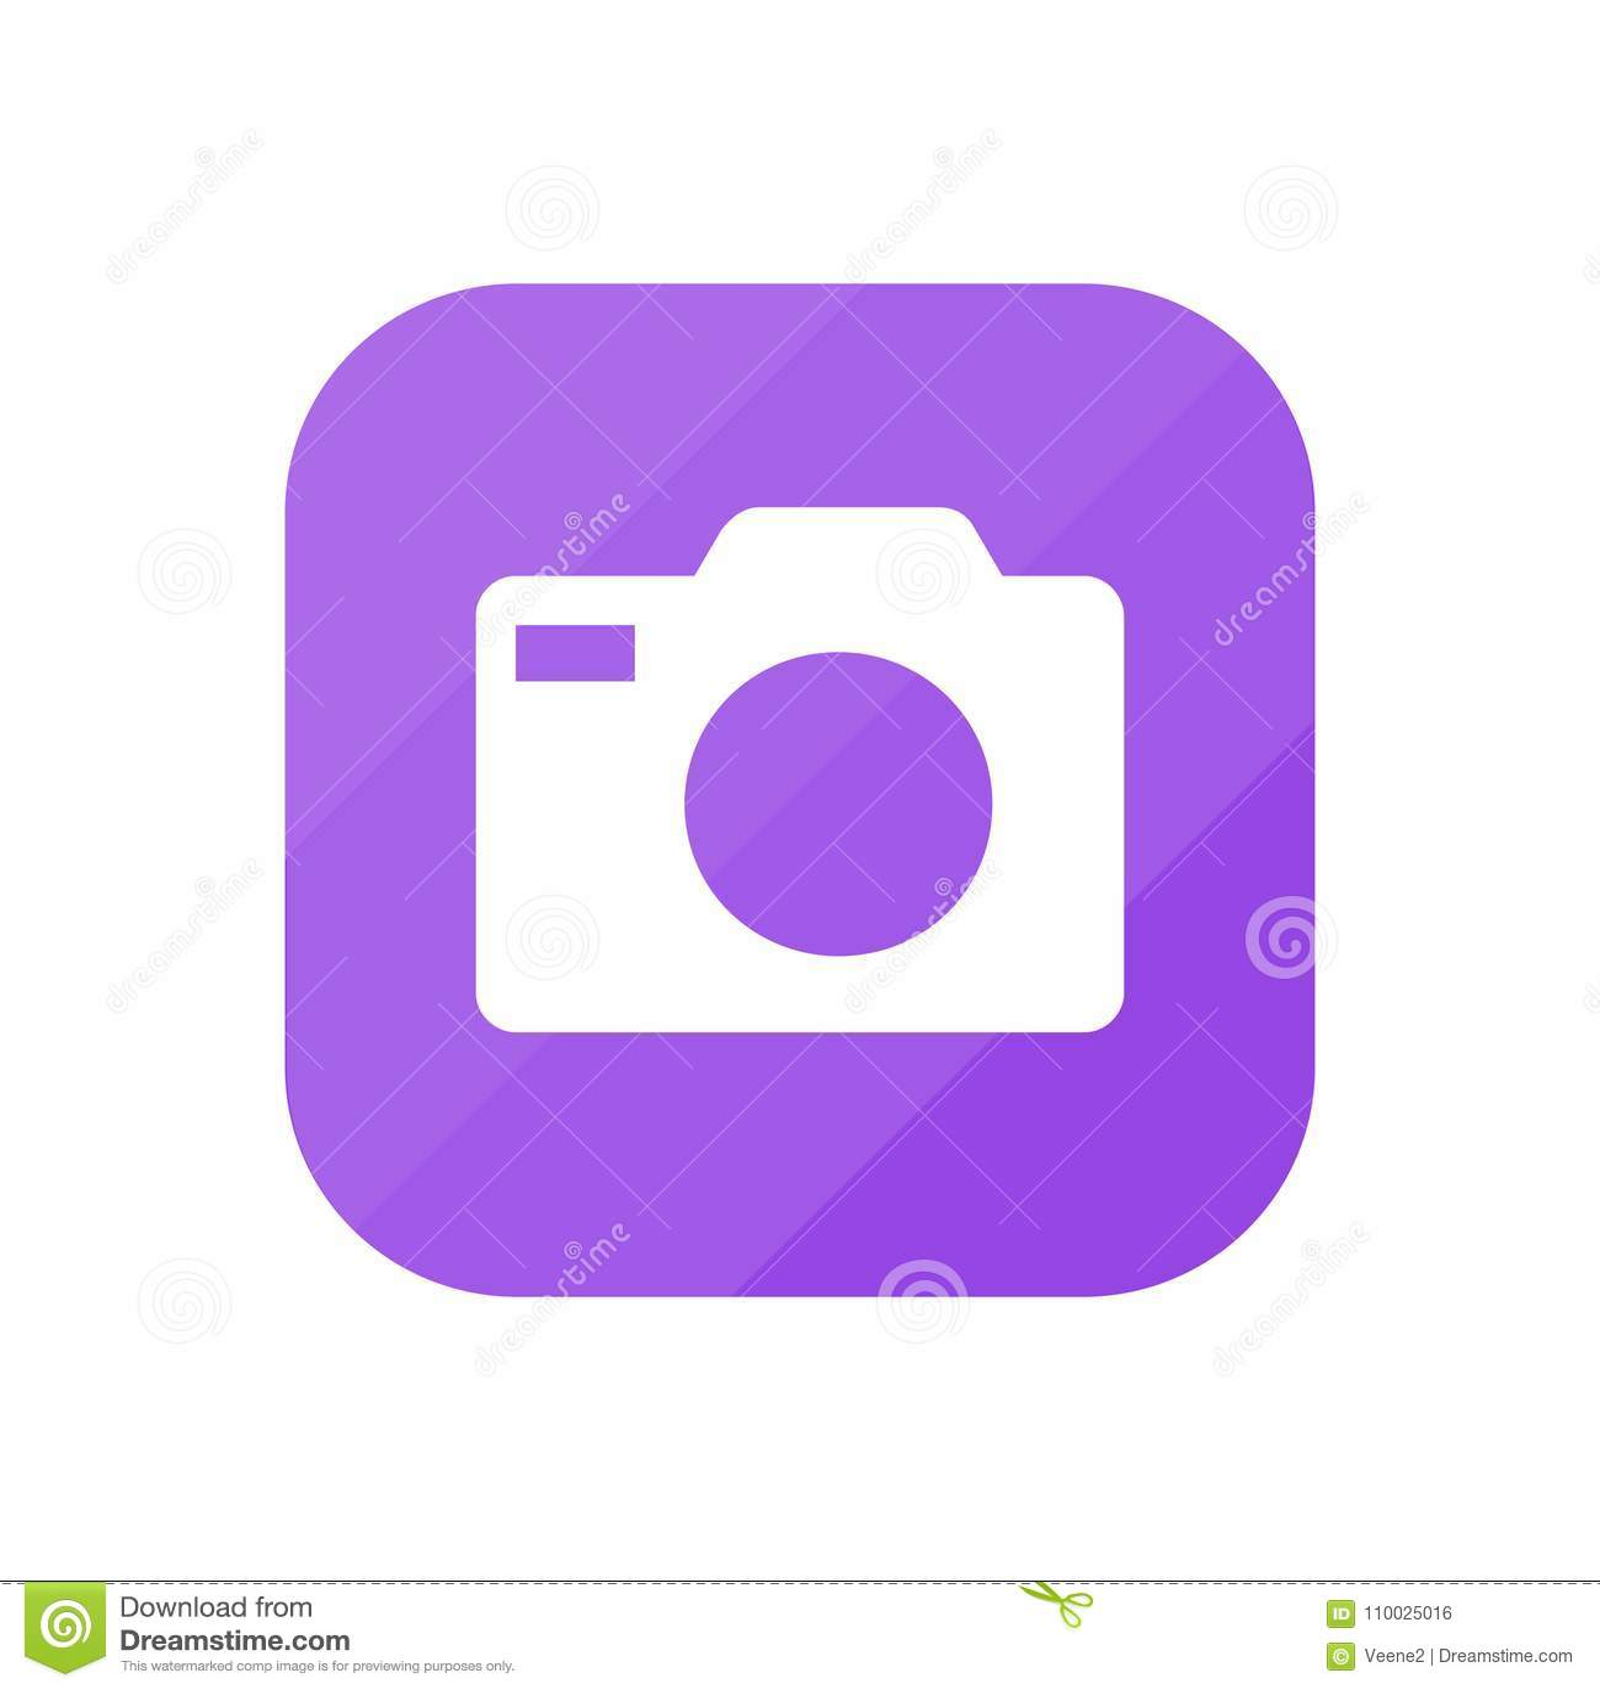 Camera - App Pictogram